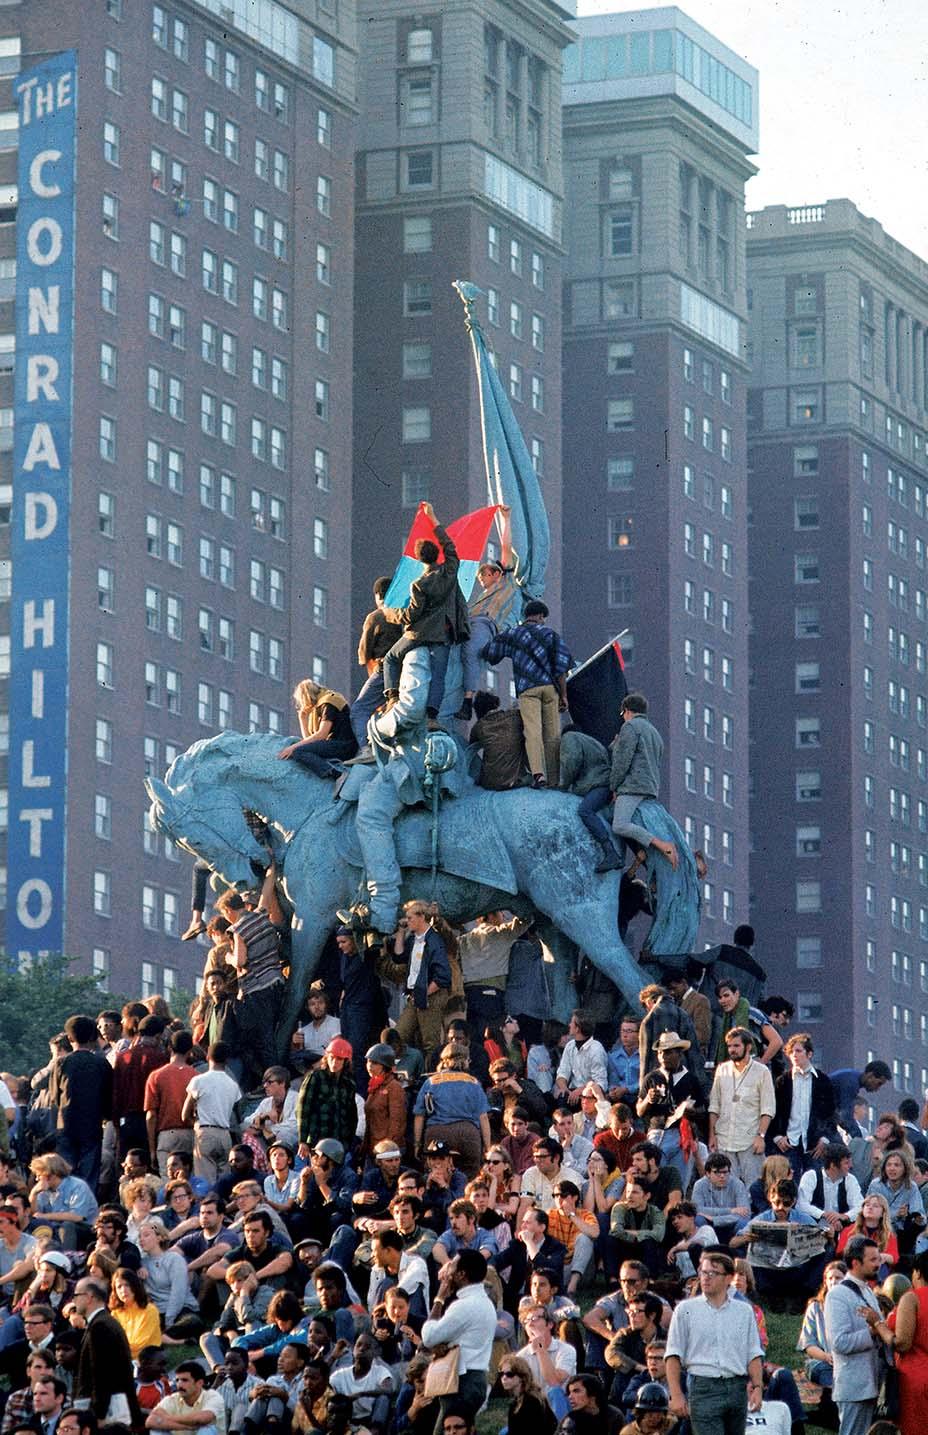 Chicago protestors - 1968 Democratic National Convention